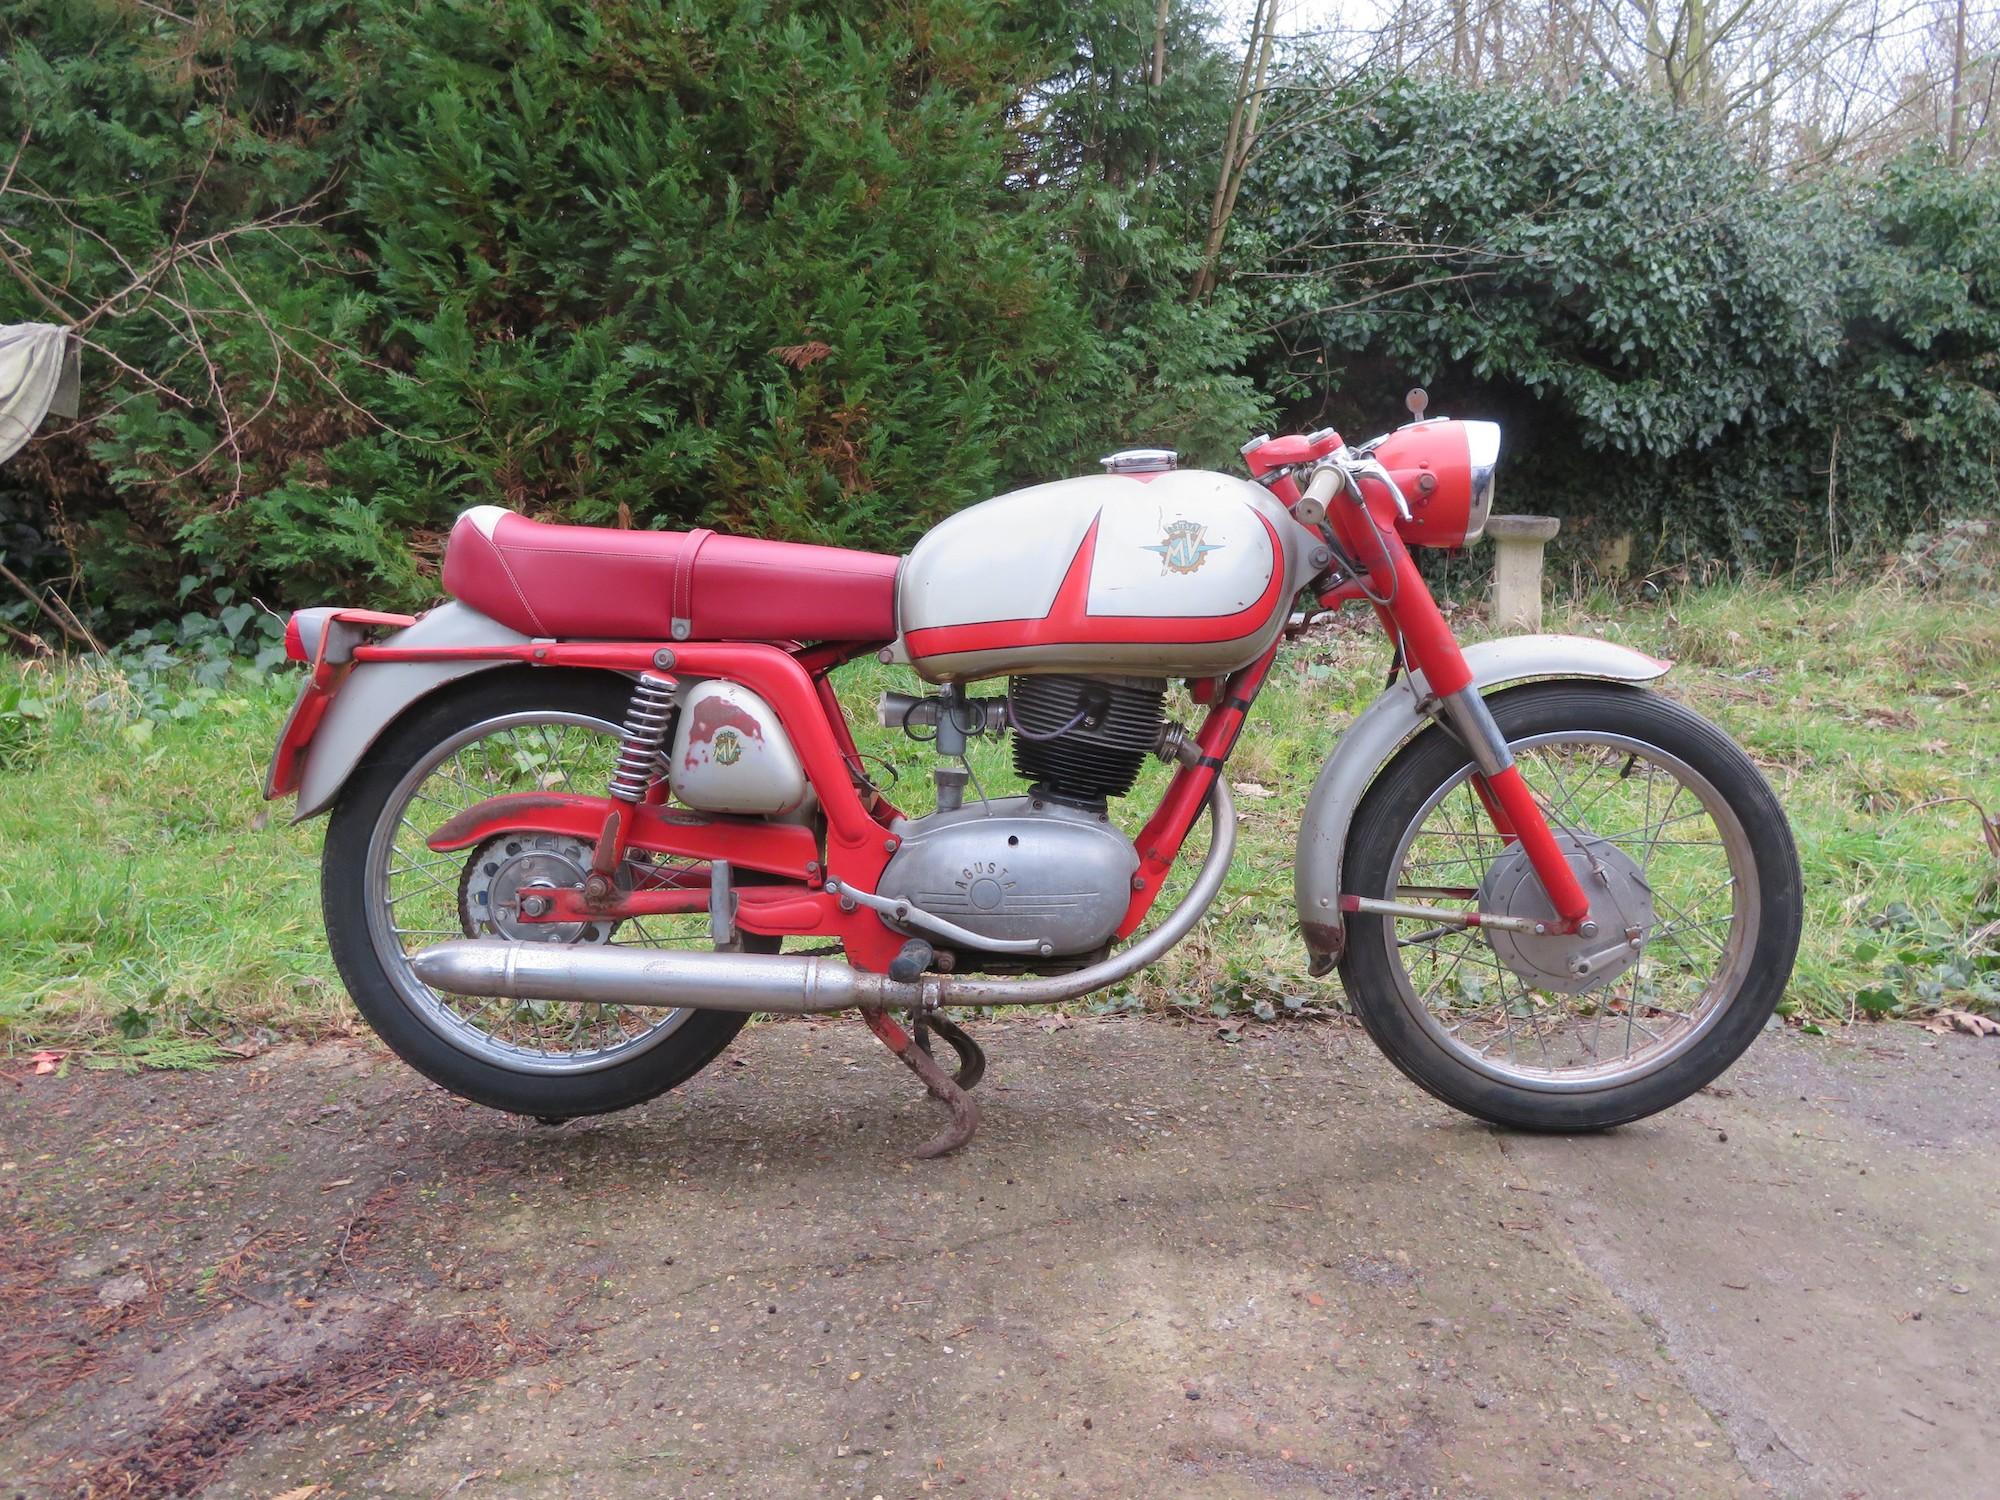 1966 MV Agusta 150cc Rapido Sport